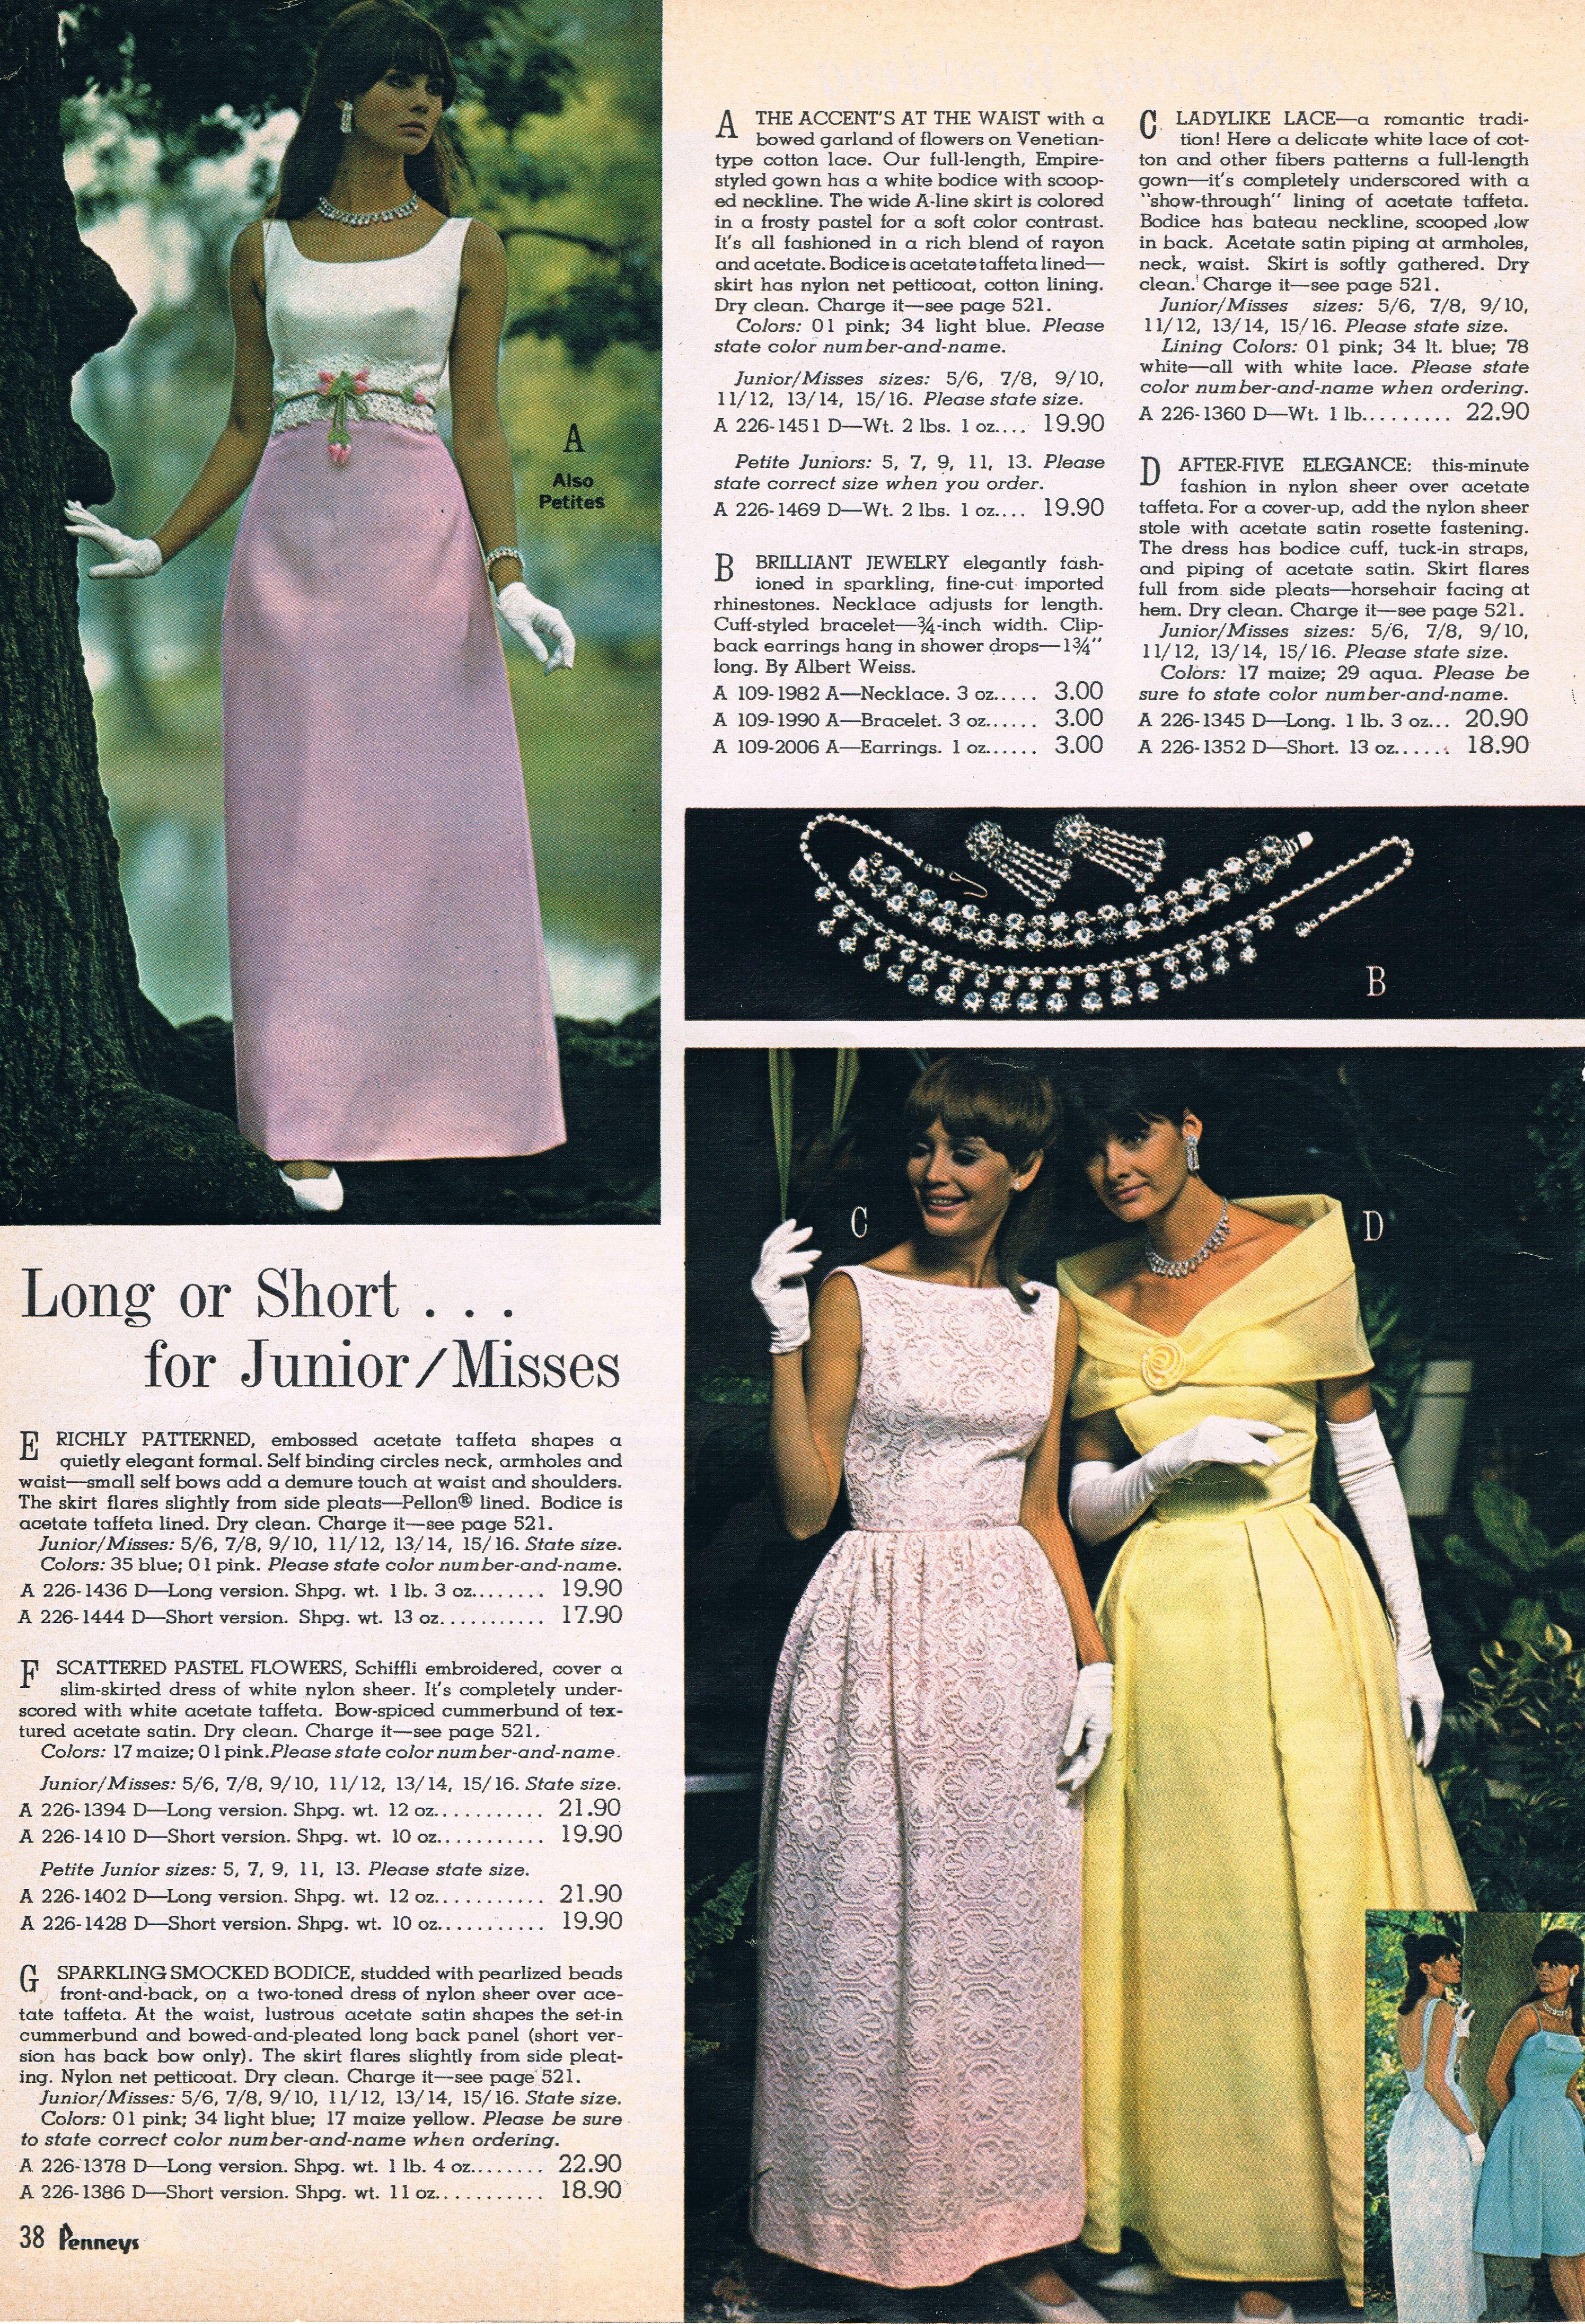 Penneys catalog 60s   classy classic retro dresses   Pinterest